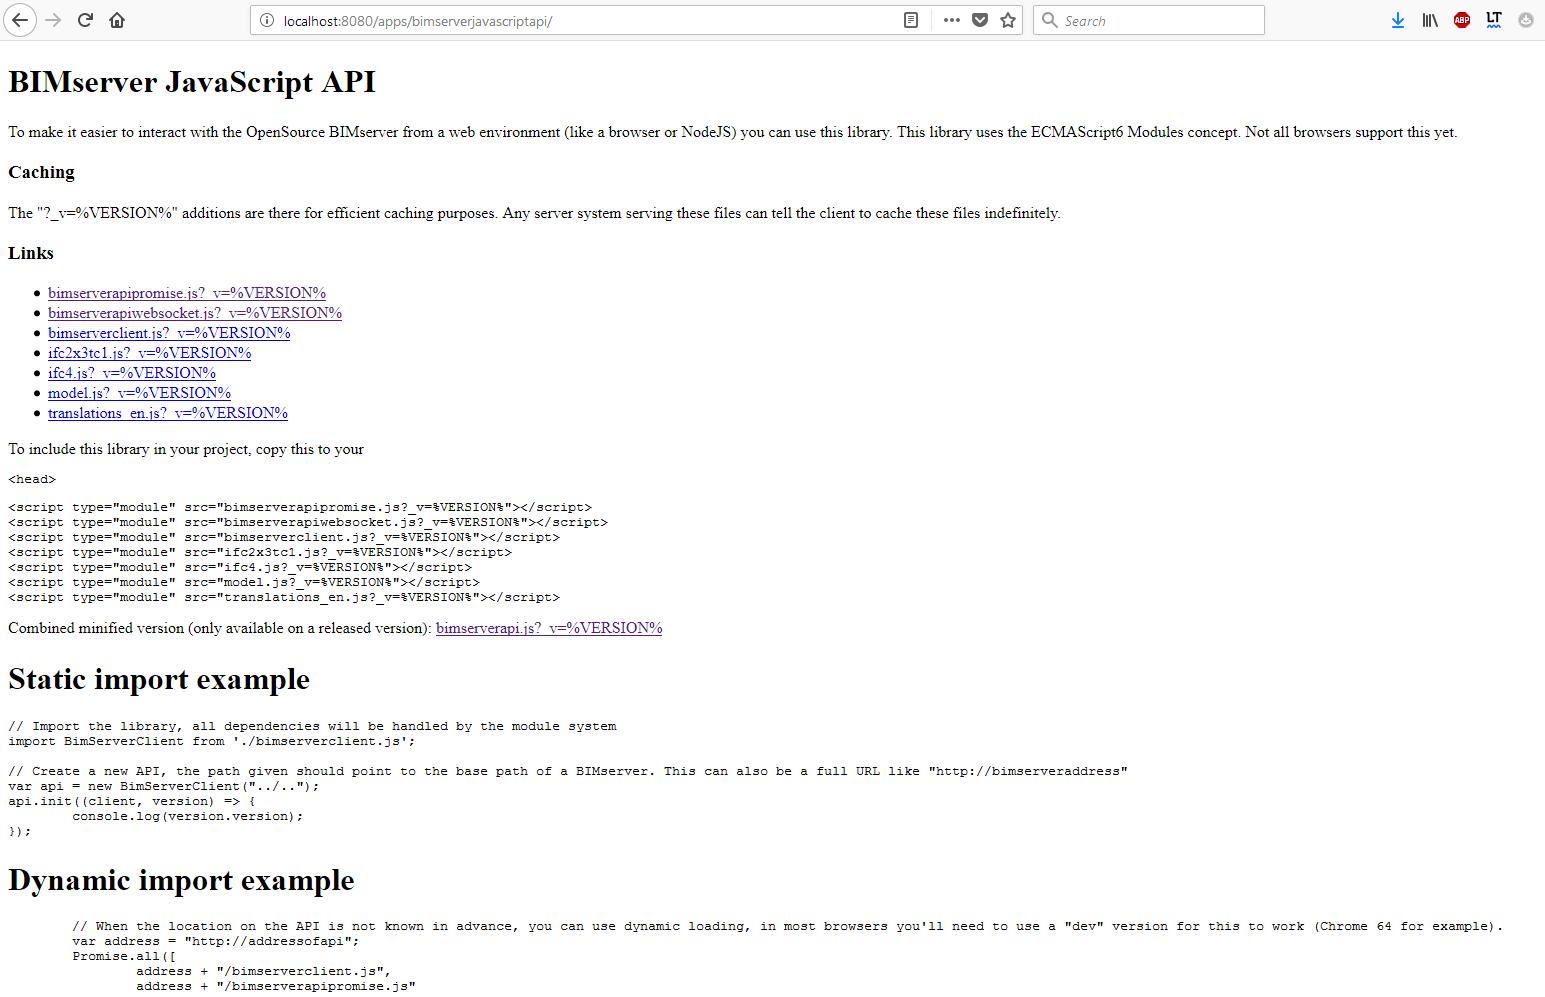 bimserver-js-api-screenshot